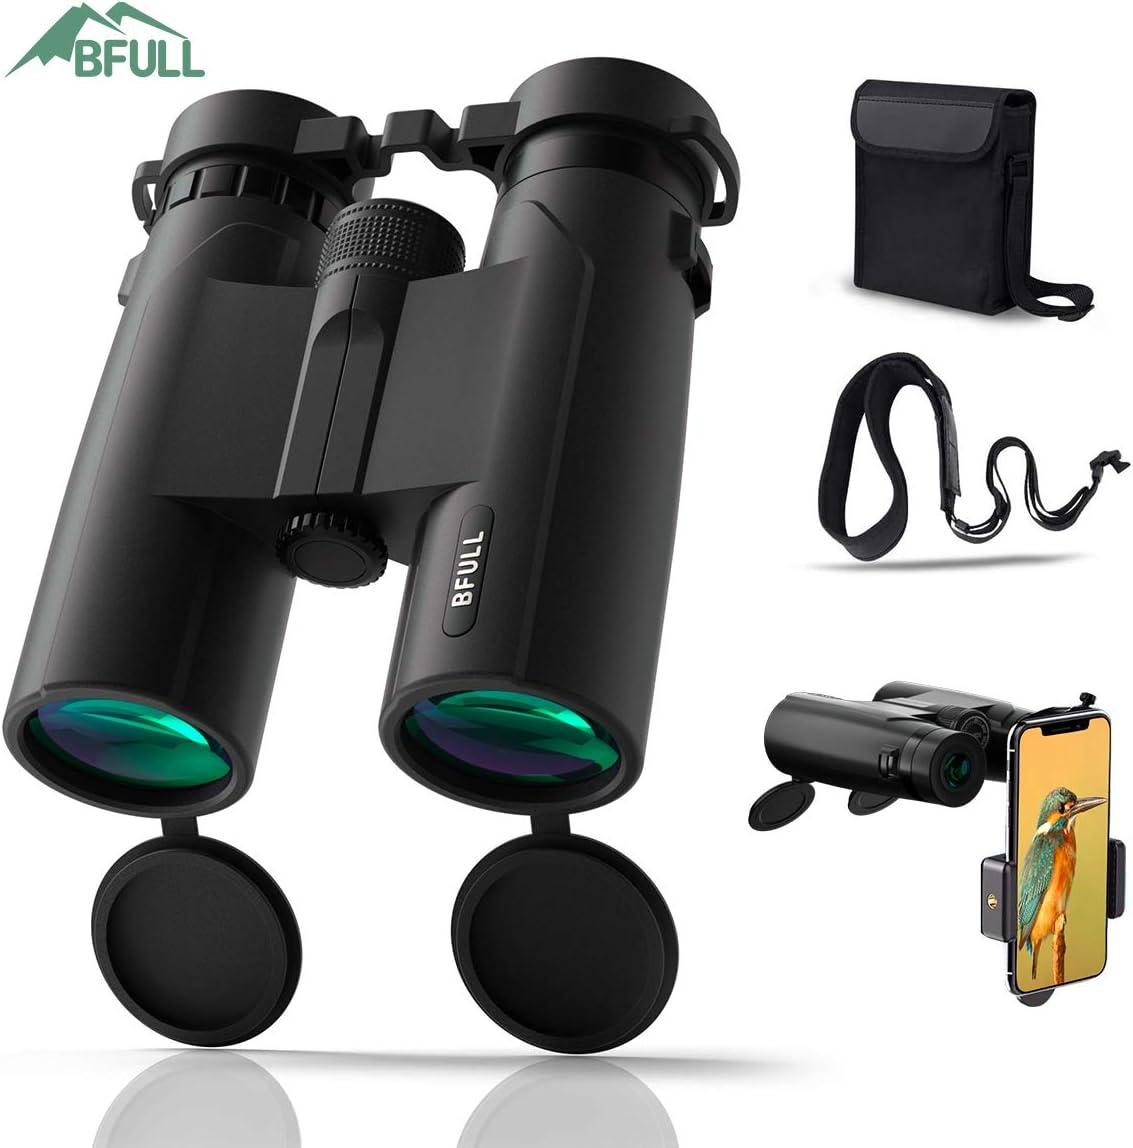 BFULL 10×42 Compact Binoculars for Adults, Powerful Binoculars with 21mm Large View Eyepiece, BAK4 Prism FMC Lens Binoculars for Bird Watching Hunting – Waterproof